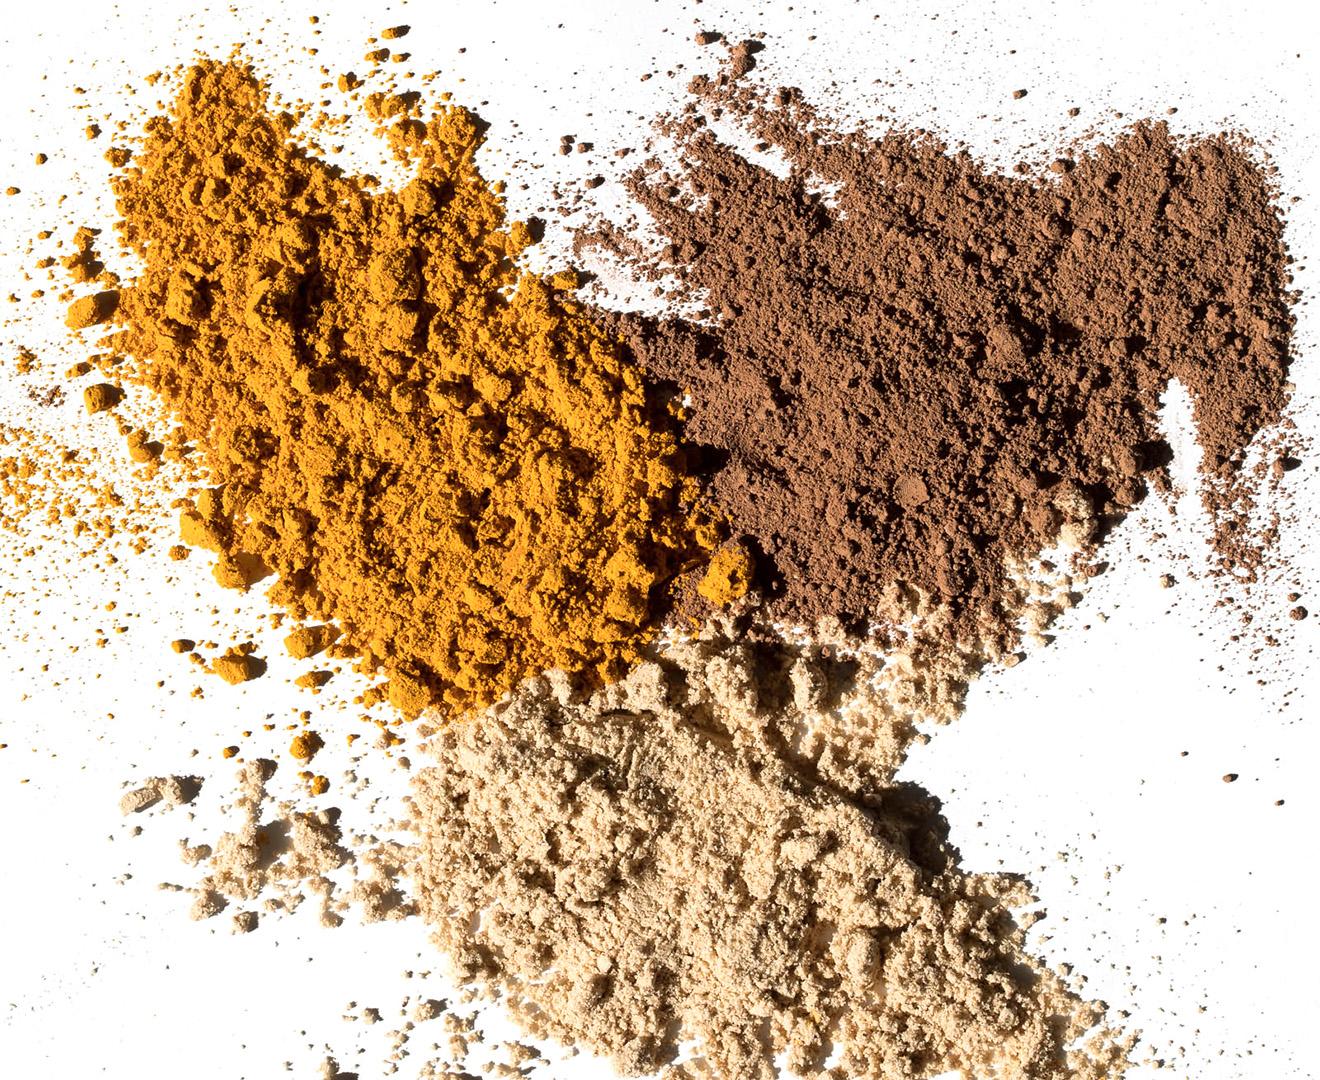 superfood powder, superfood elixir